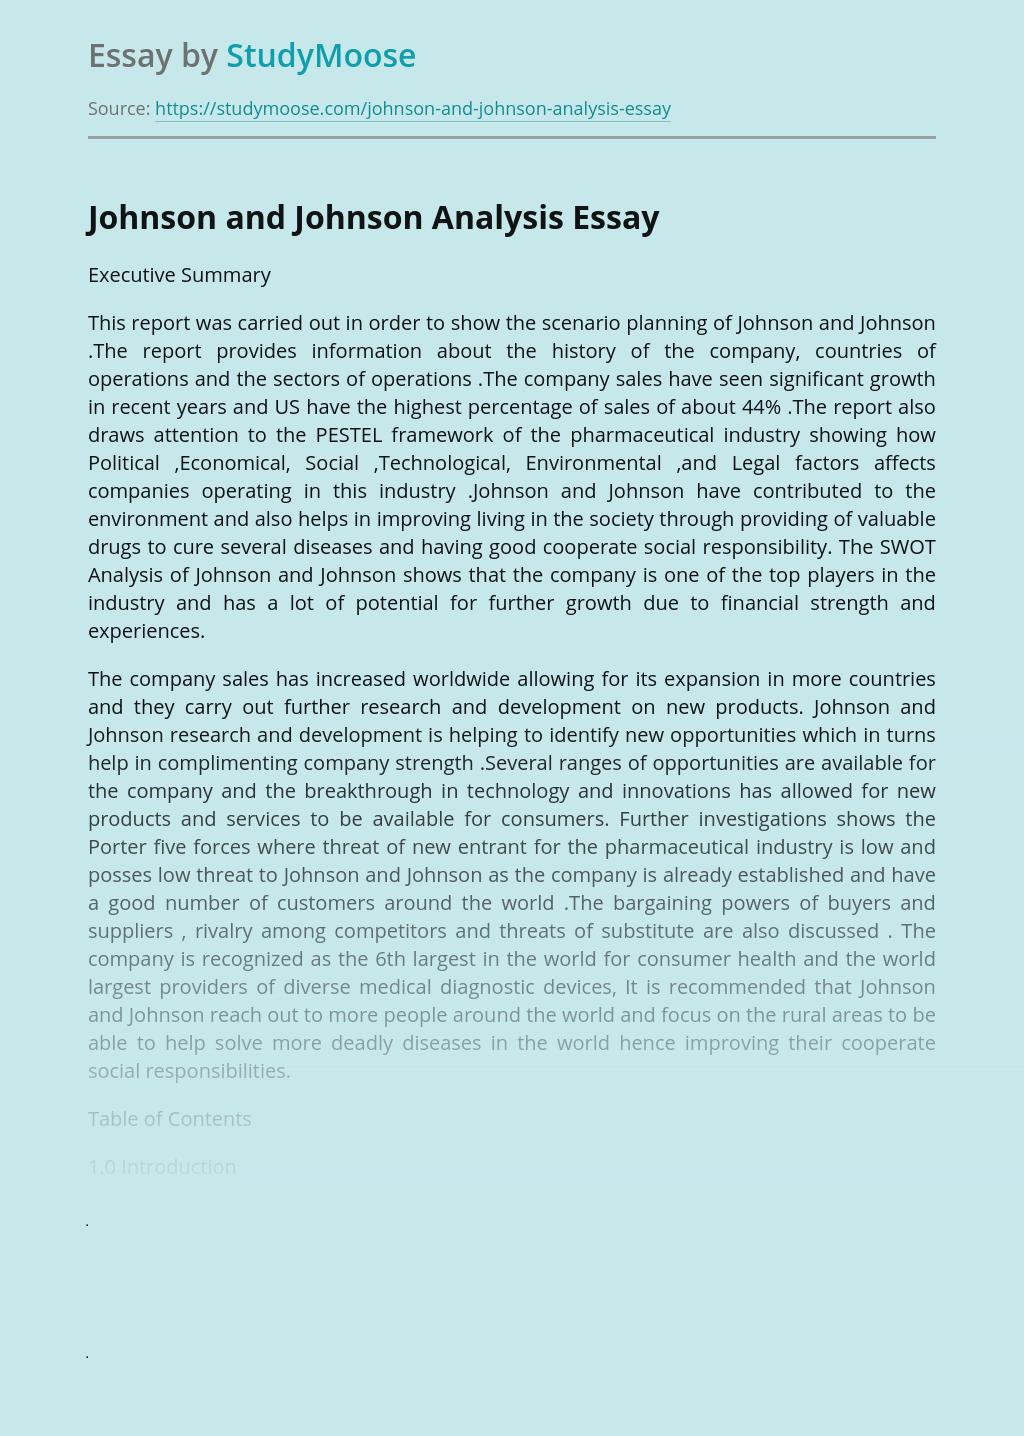 Johnson and Johnson Analysis